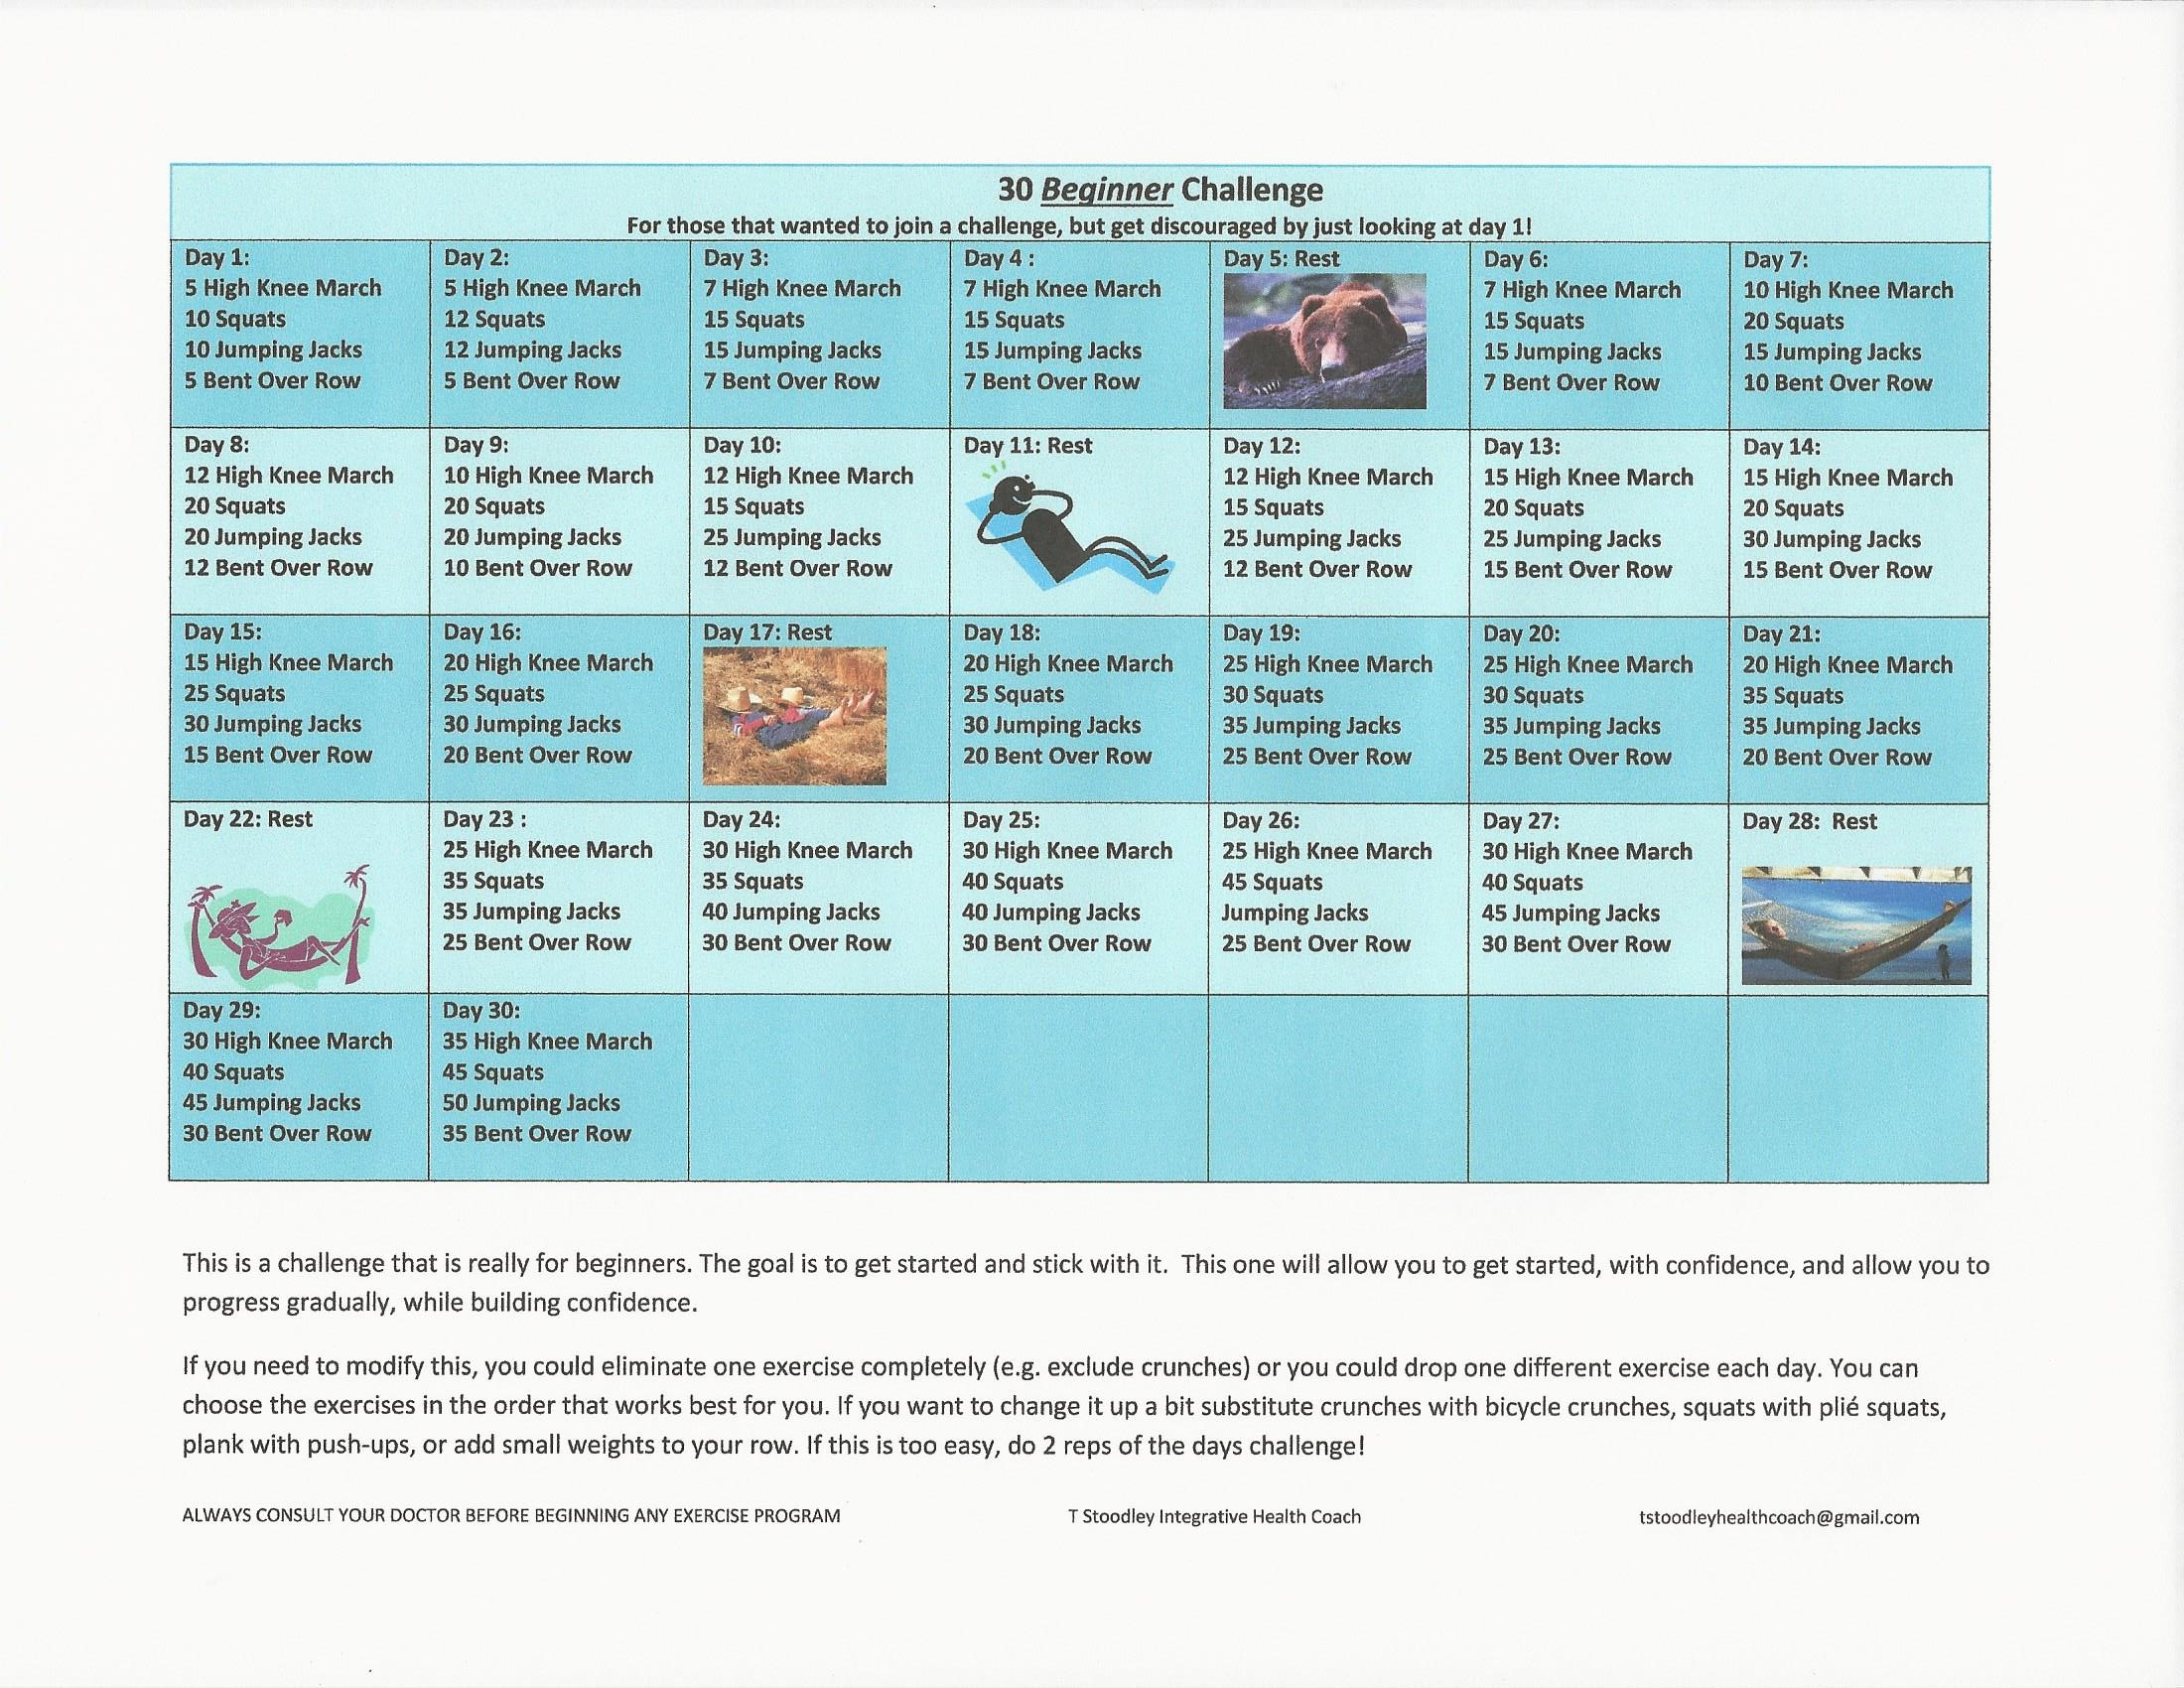 Beginner 30 day Alternate Challenge